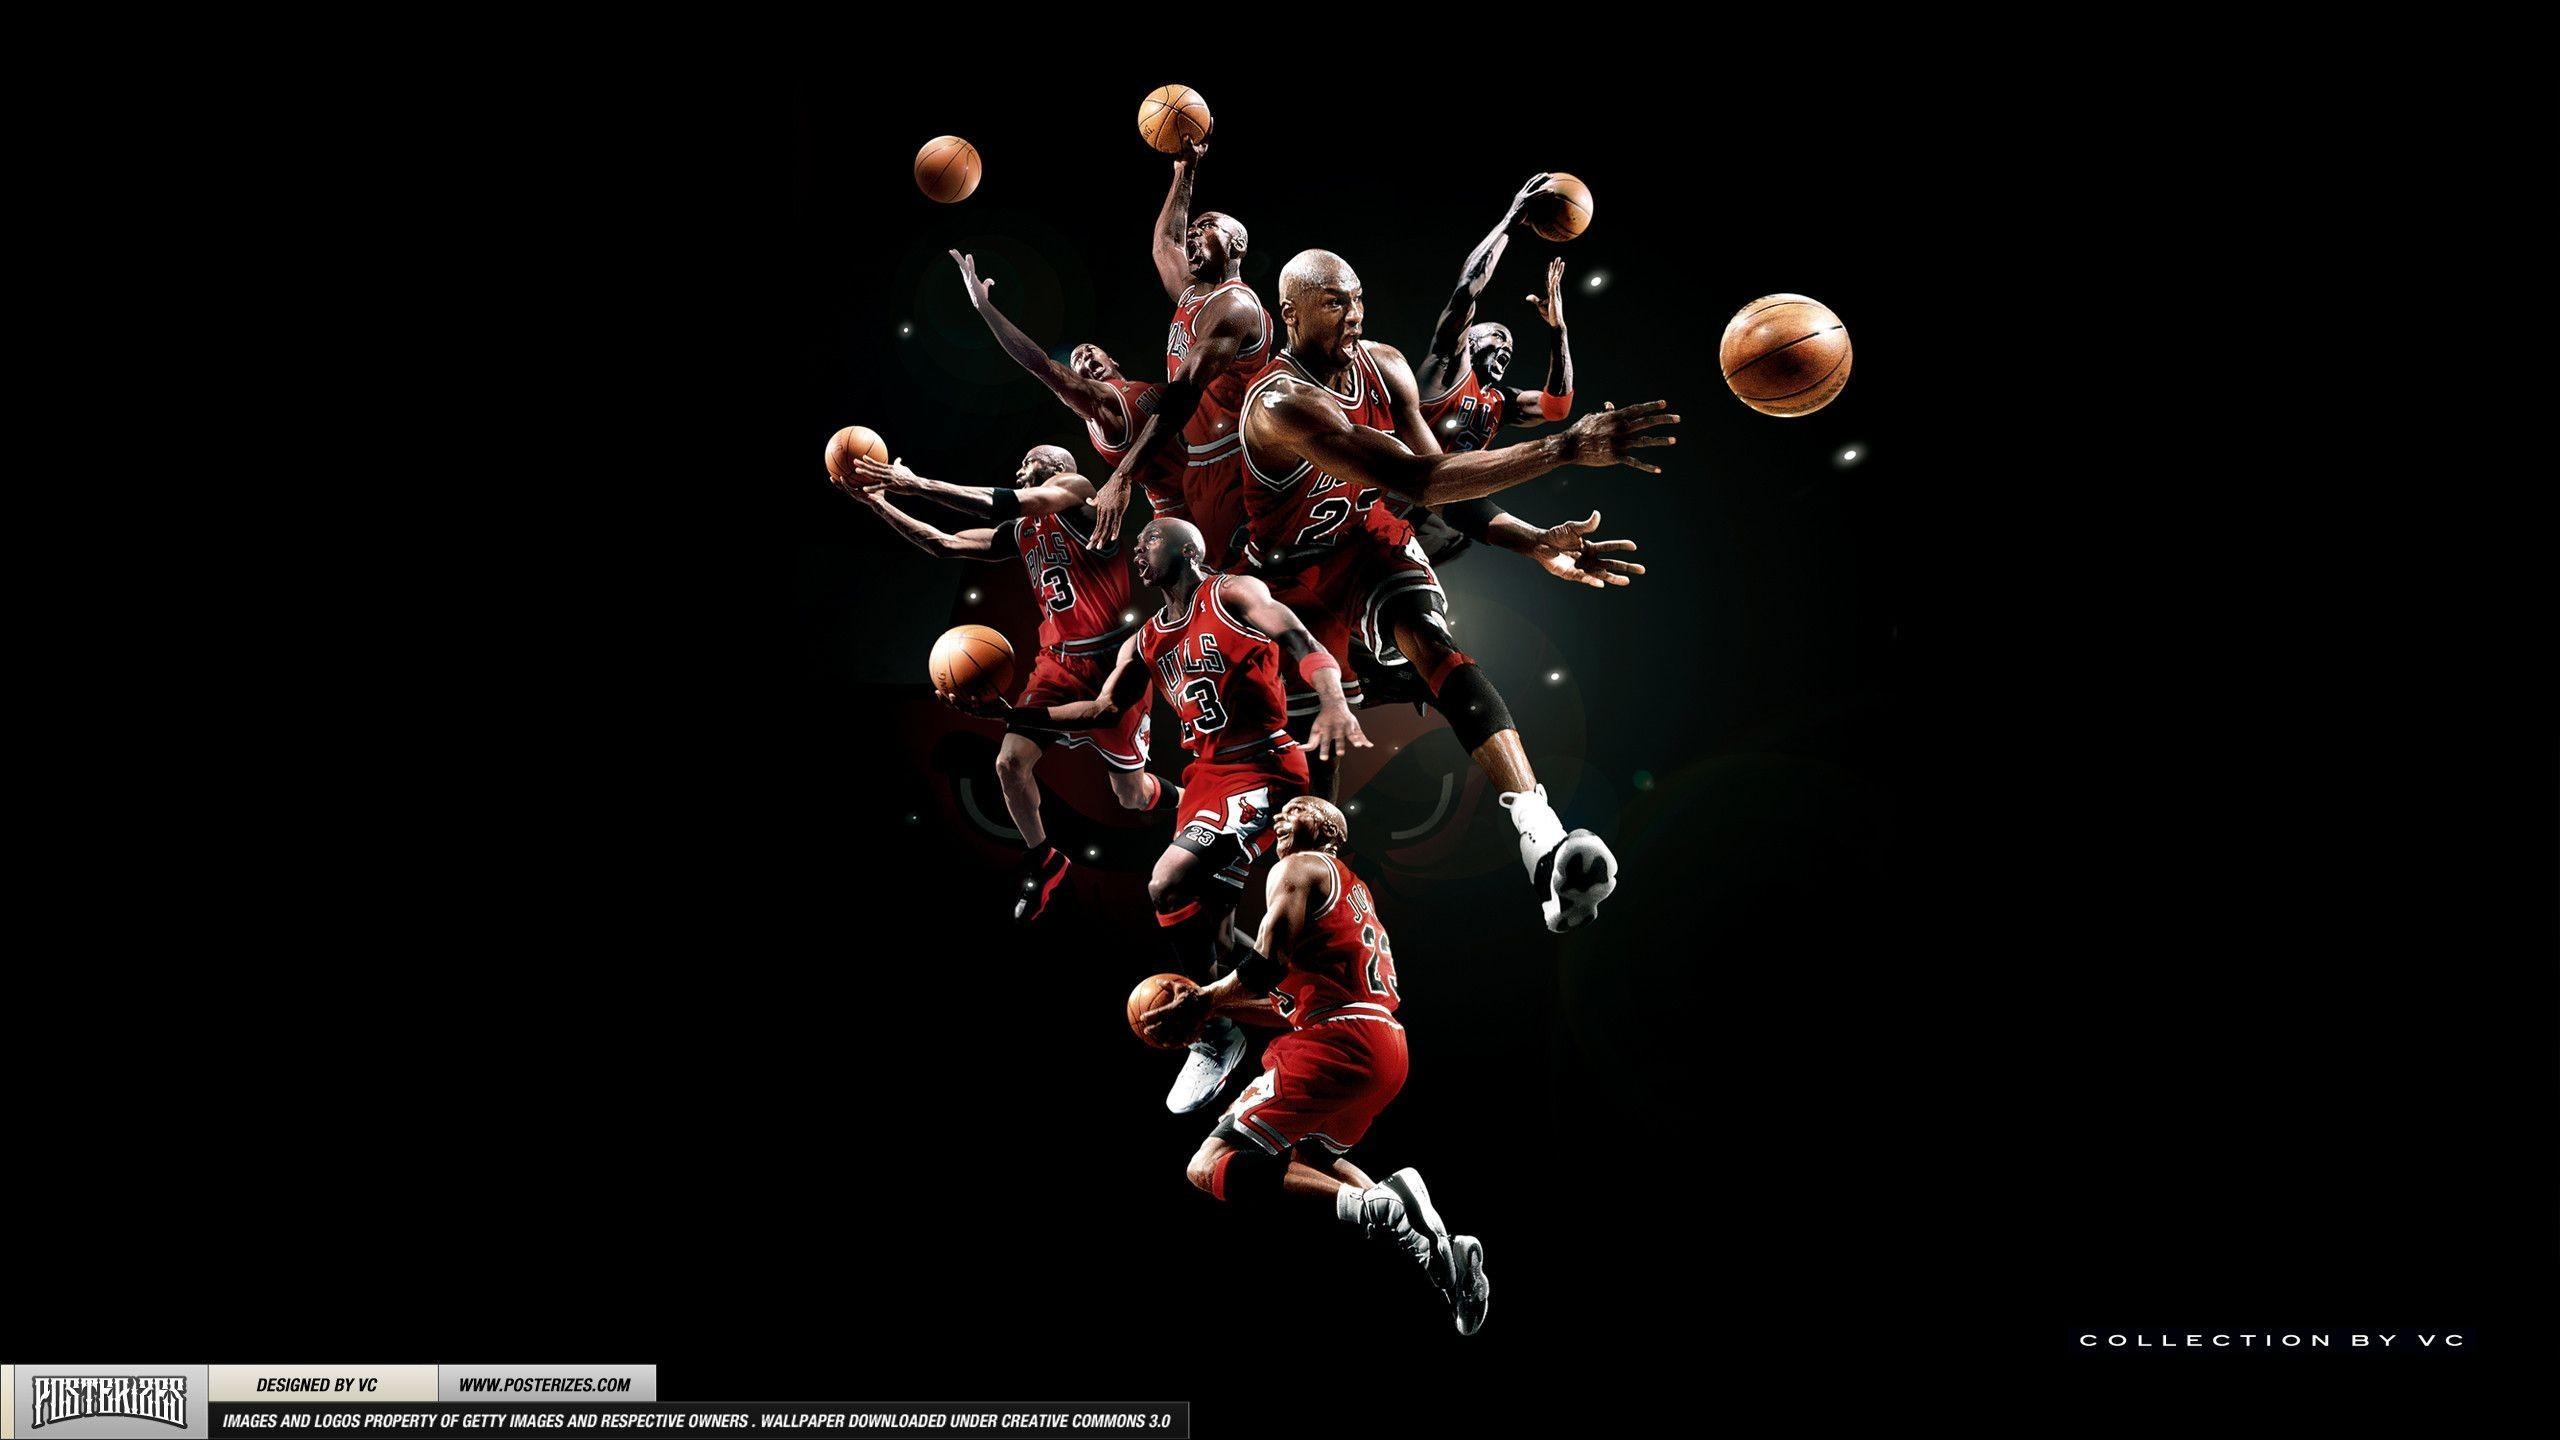 Jordan HD Wallpapers Wallpaper · Chicago Bulls …